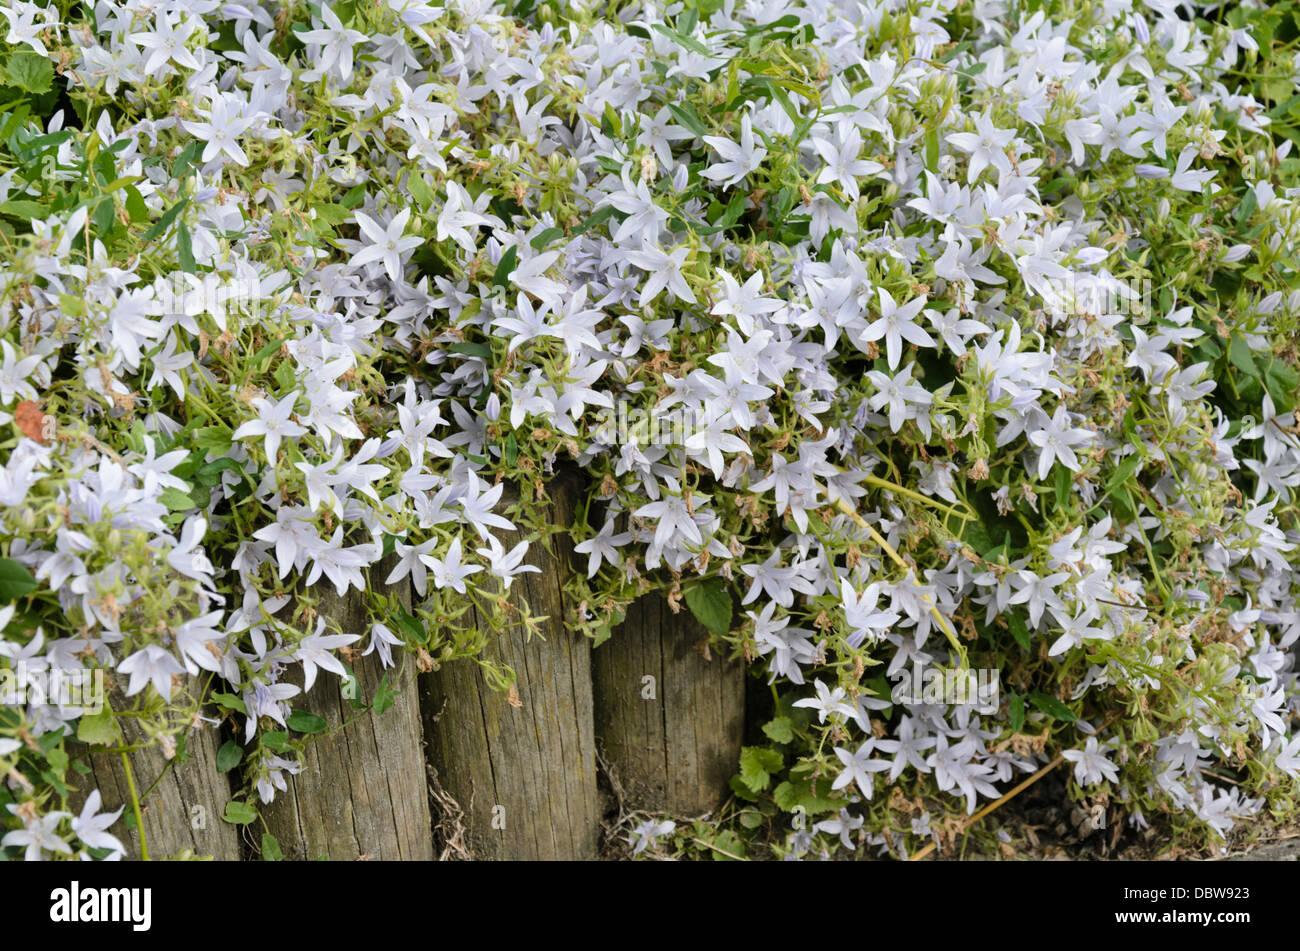 Serbian bellflower (Campanula poscharskyana 'Hirsch White') - Stock Image